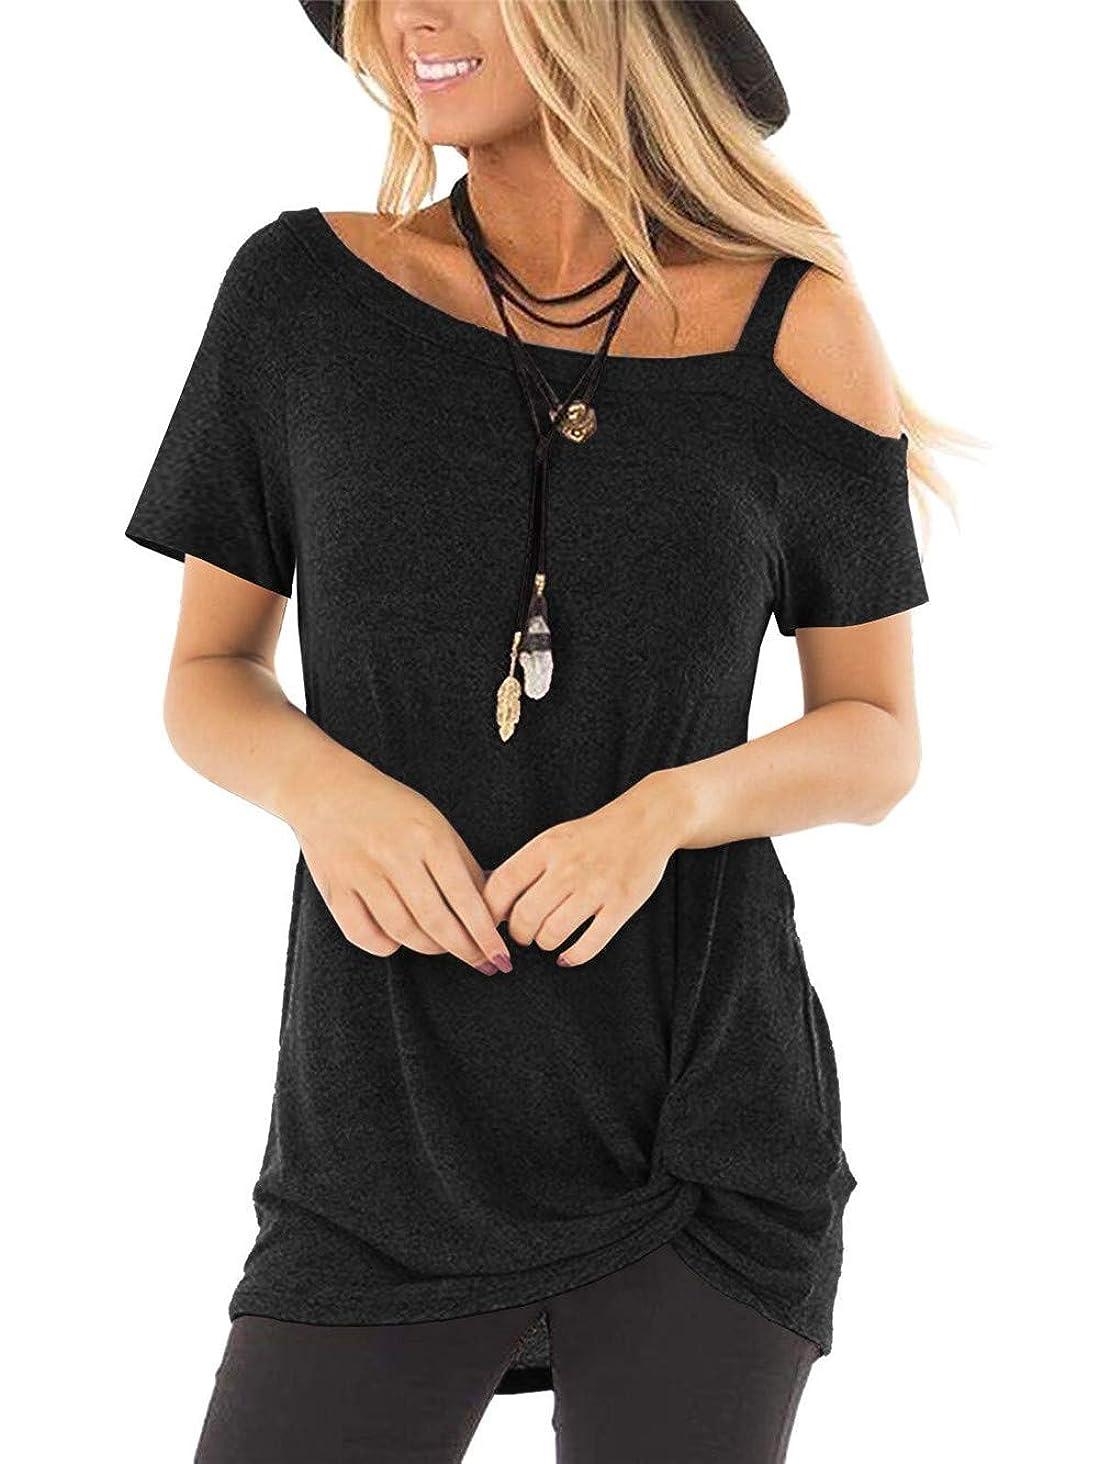 Tivifox Women's Cold Shoulder Cute Tops Short Sleeve Knot Twist Front Tunic T Shirt